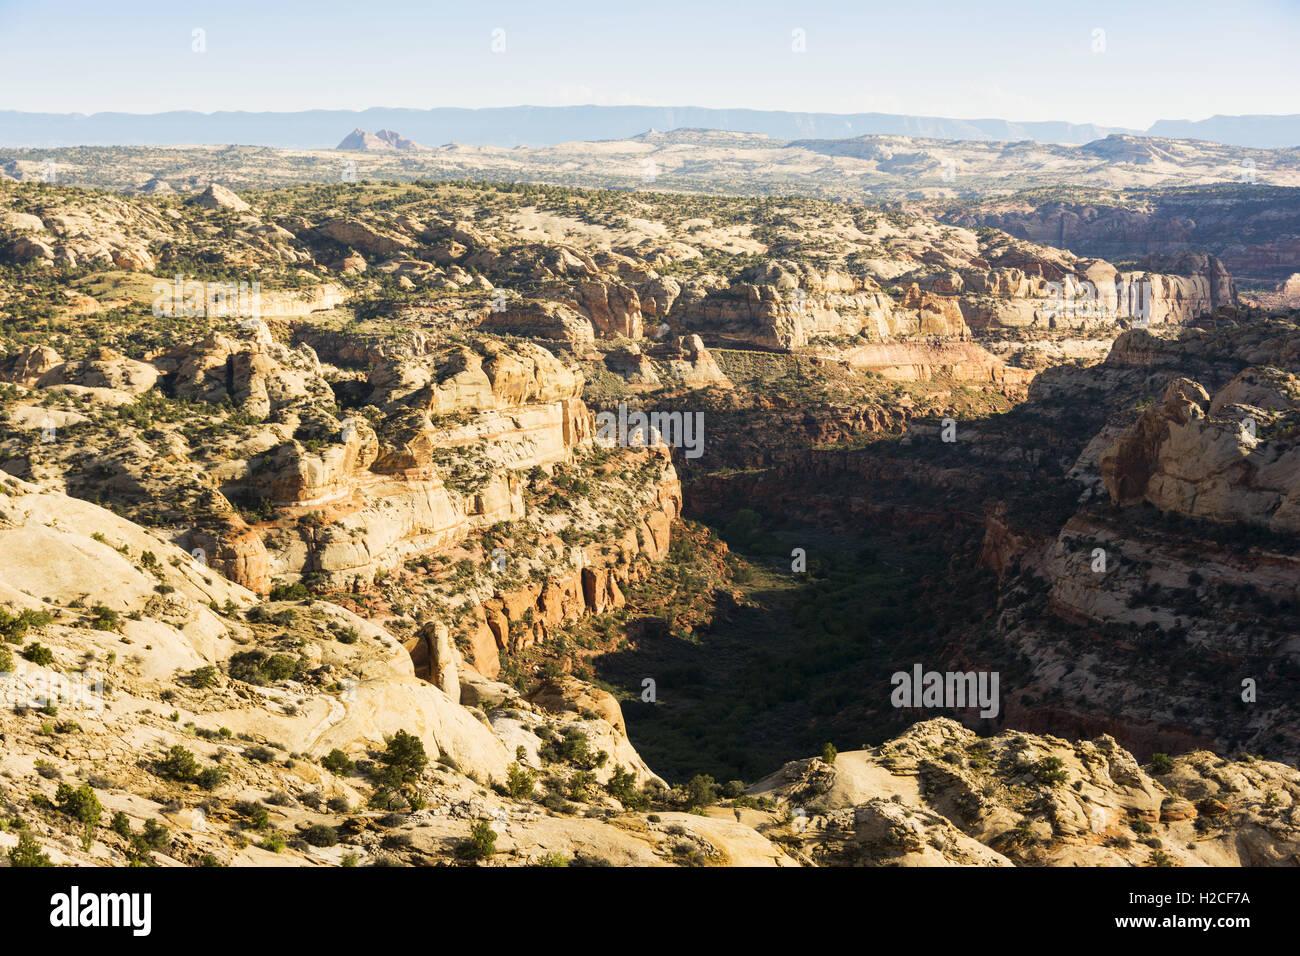 Utah, Grand Staircase-Escalante National Monument, Hell's Backbone, landscape - Stock Image